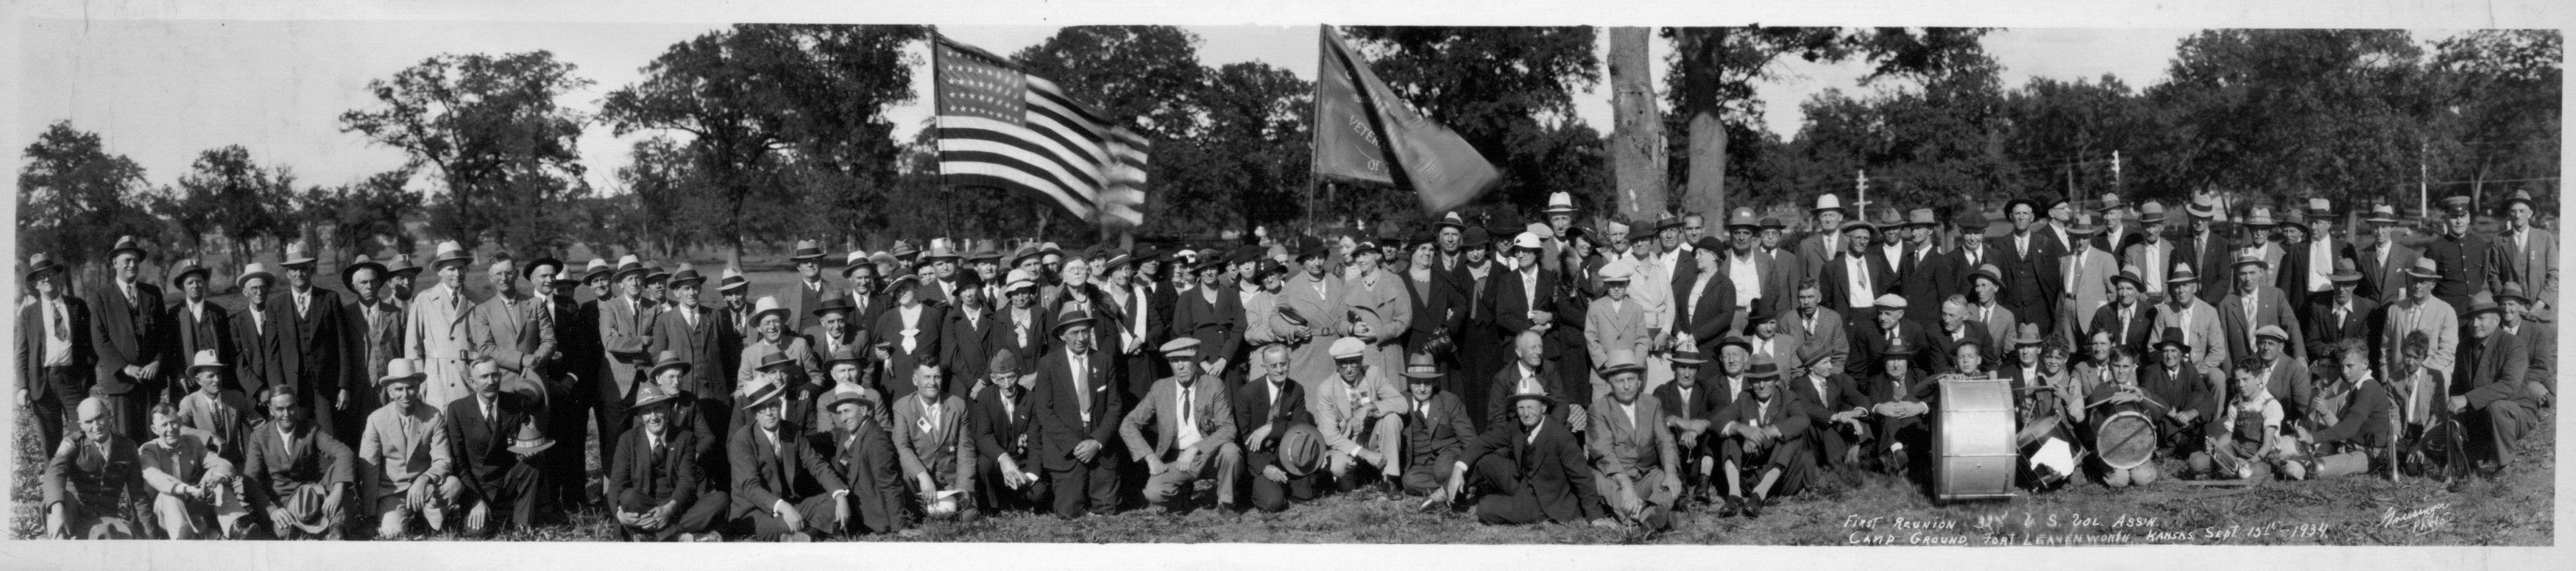 First reunion of the 32nd U. S. Volunteer Association, Fort Leavenworth